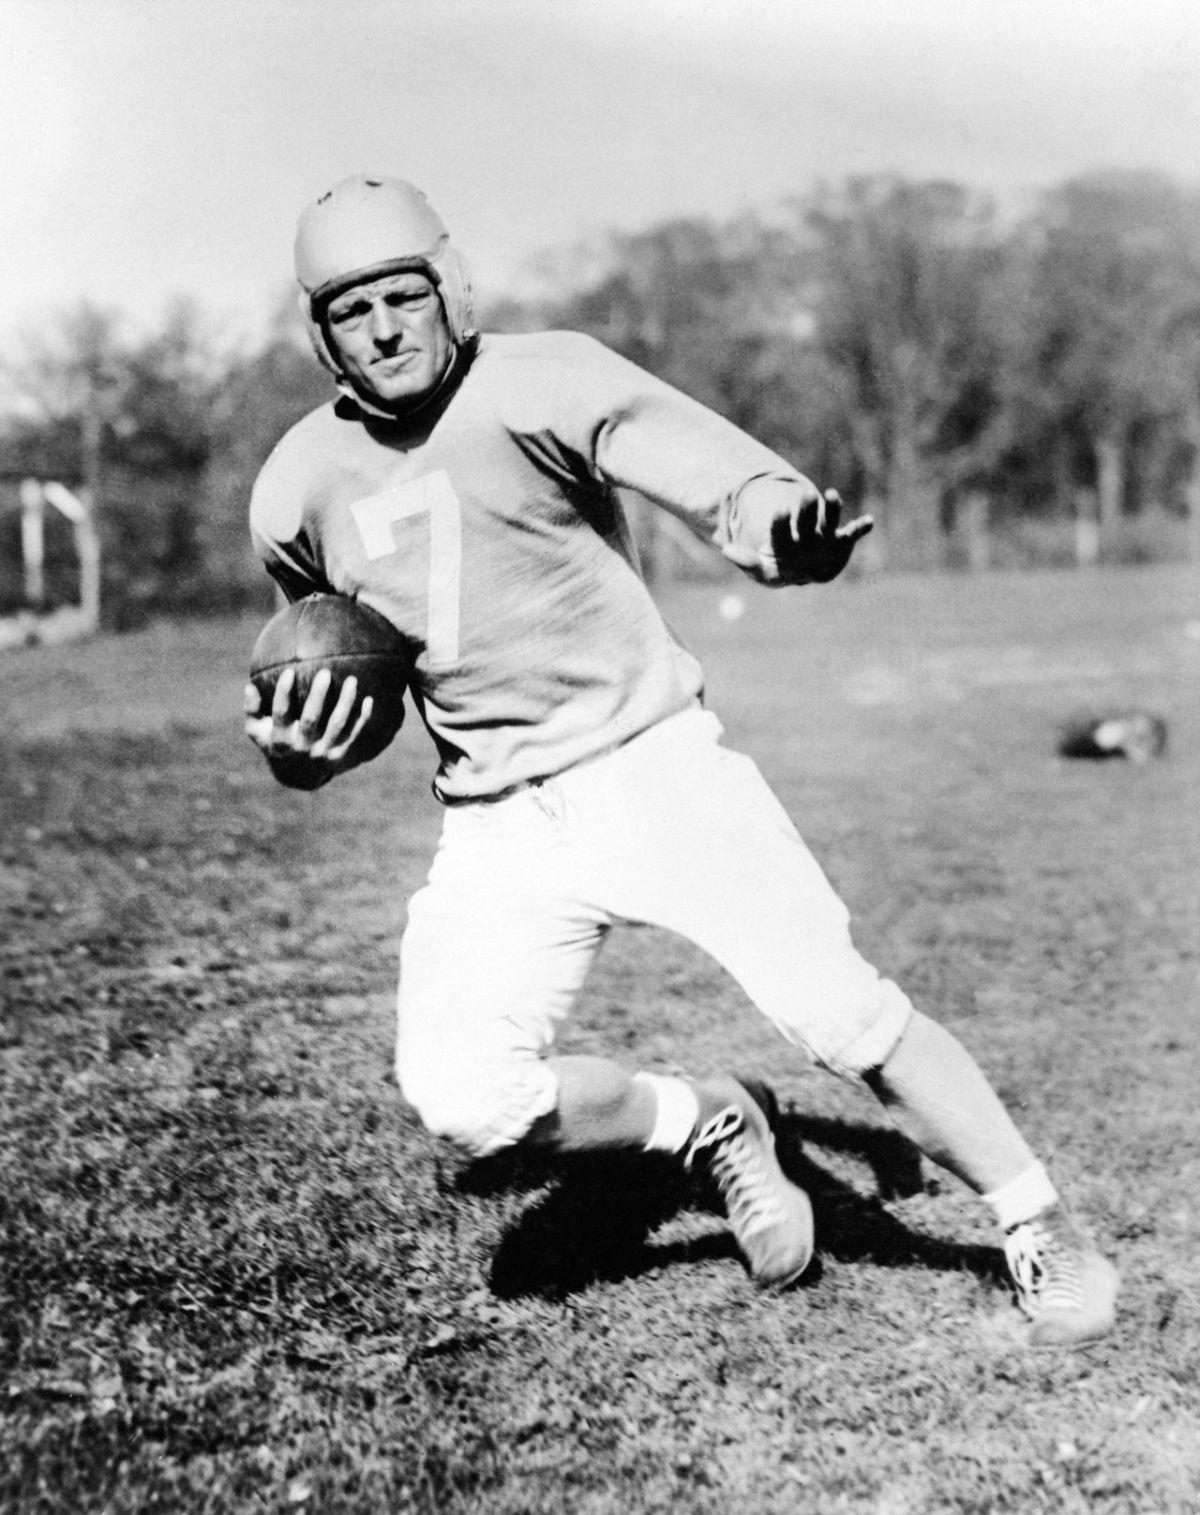 Photo Courtesy Pro Football Hall of Fame